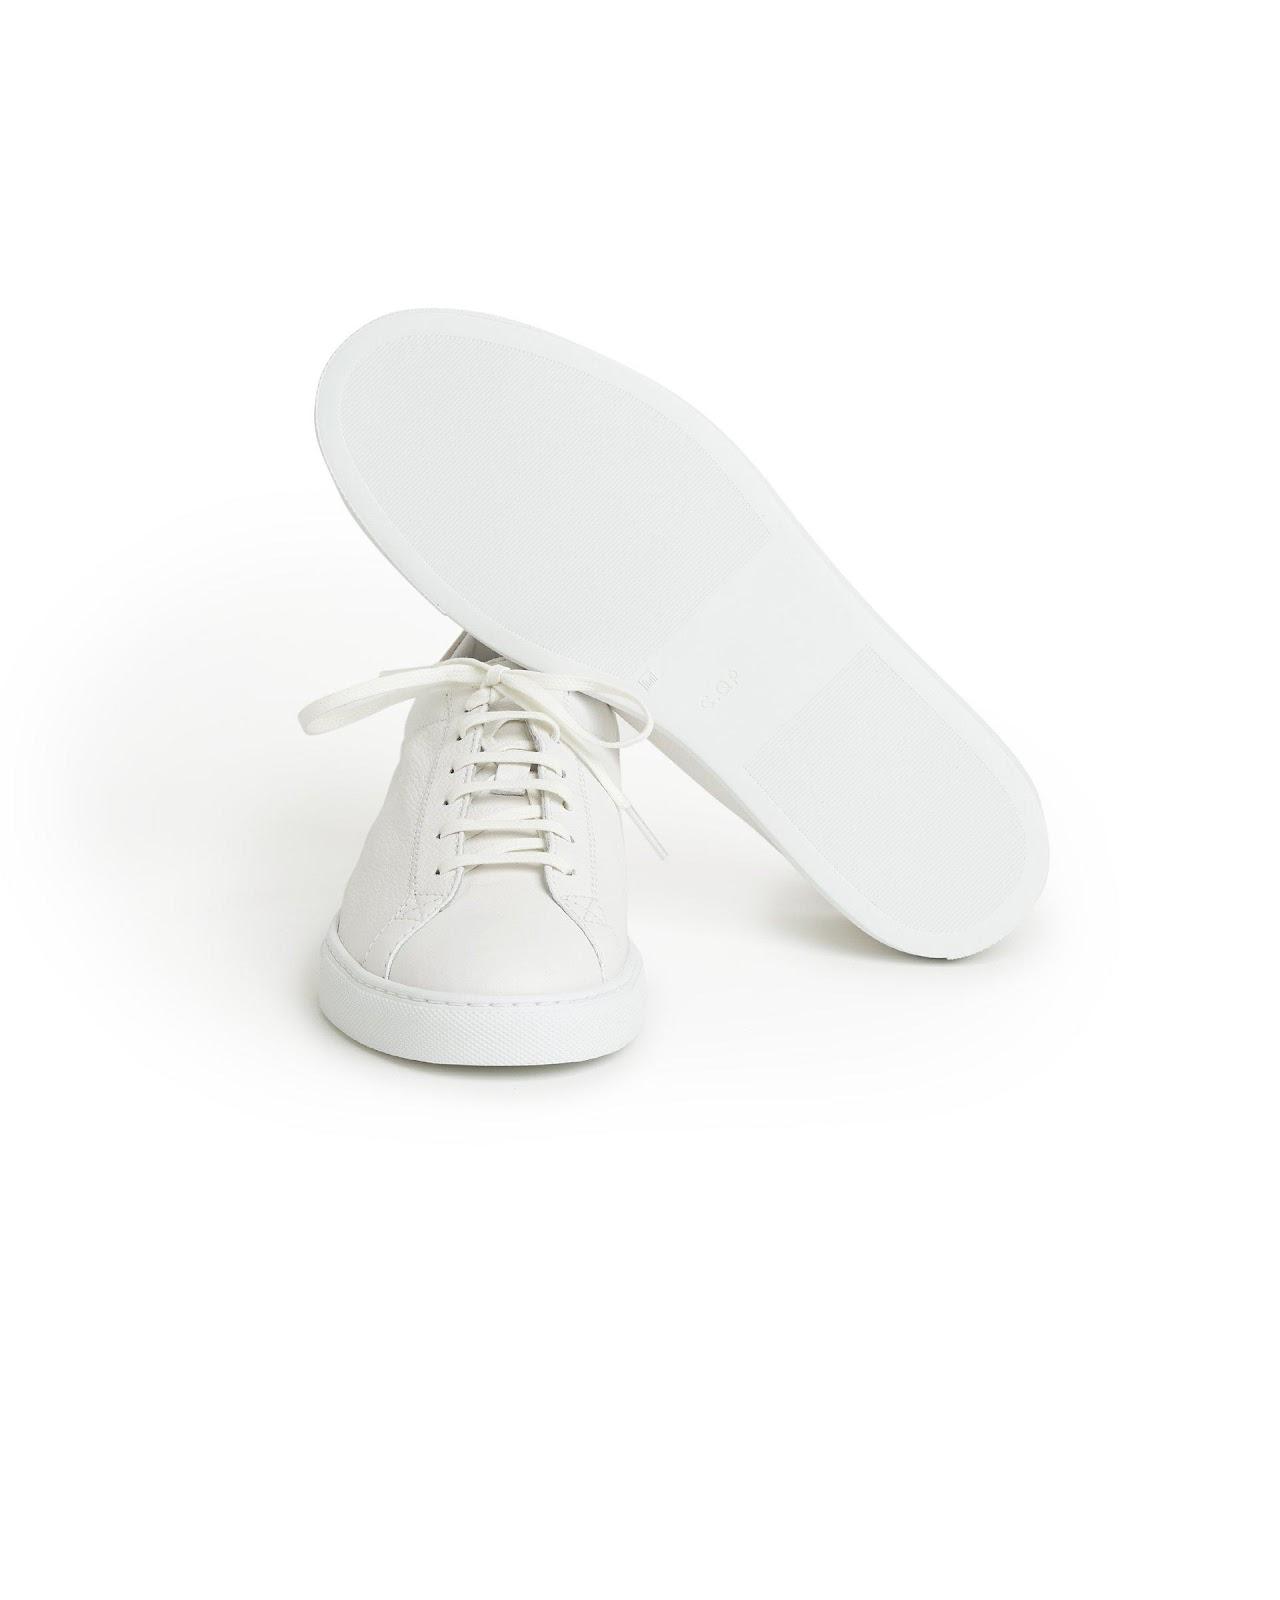 """CQP Racquet Sneaker White Leather"" รองเท้ามินิมอลสไตล์สแกนดิเนเวียน 04"